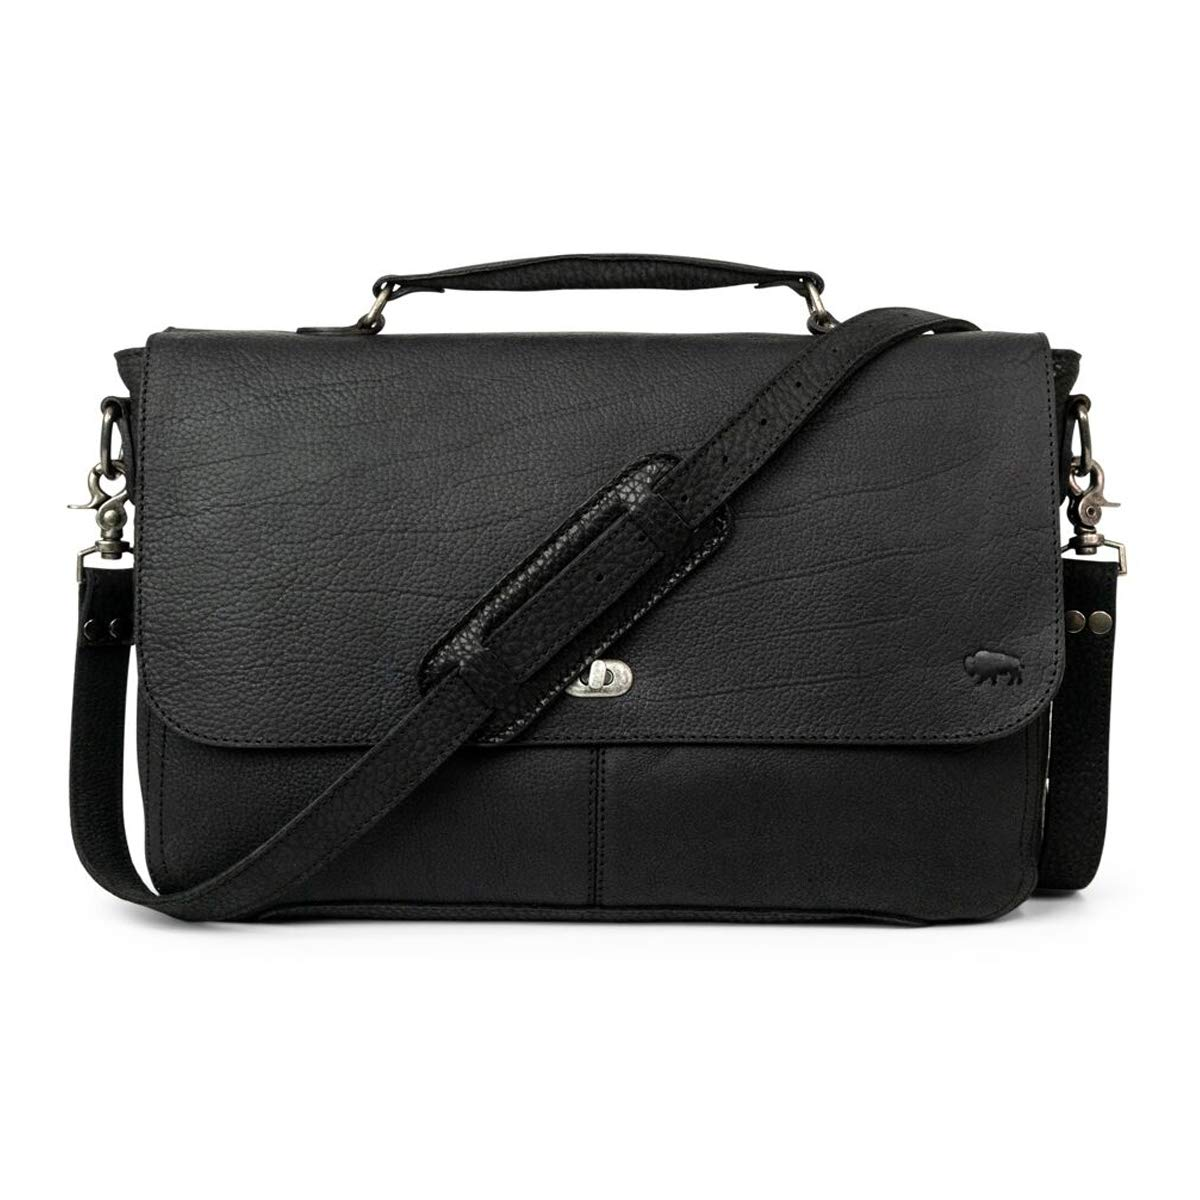 Full Grain Bison Leather Laptop Messenger Bag for Men | Ryder Reserve by Buffalo Jackson | Briefcase Fits 13'' 14'' 15'' Laptops | Made in North America | Black